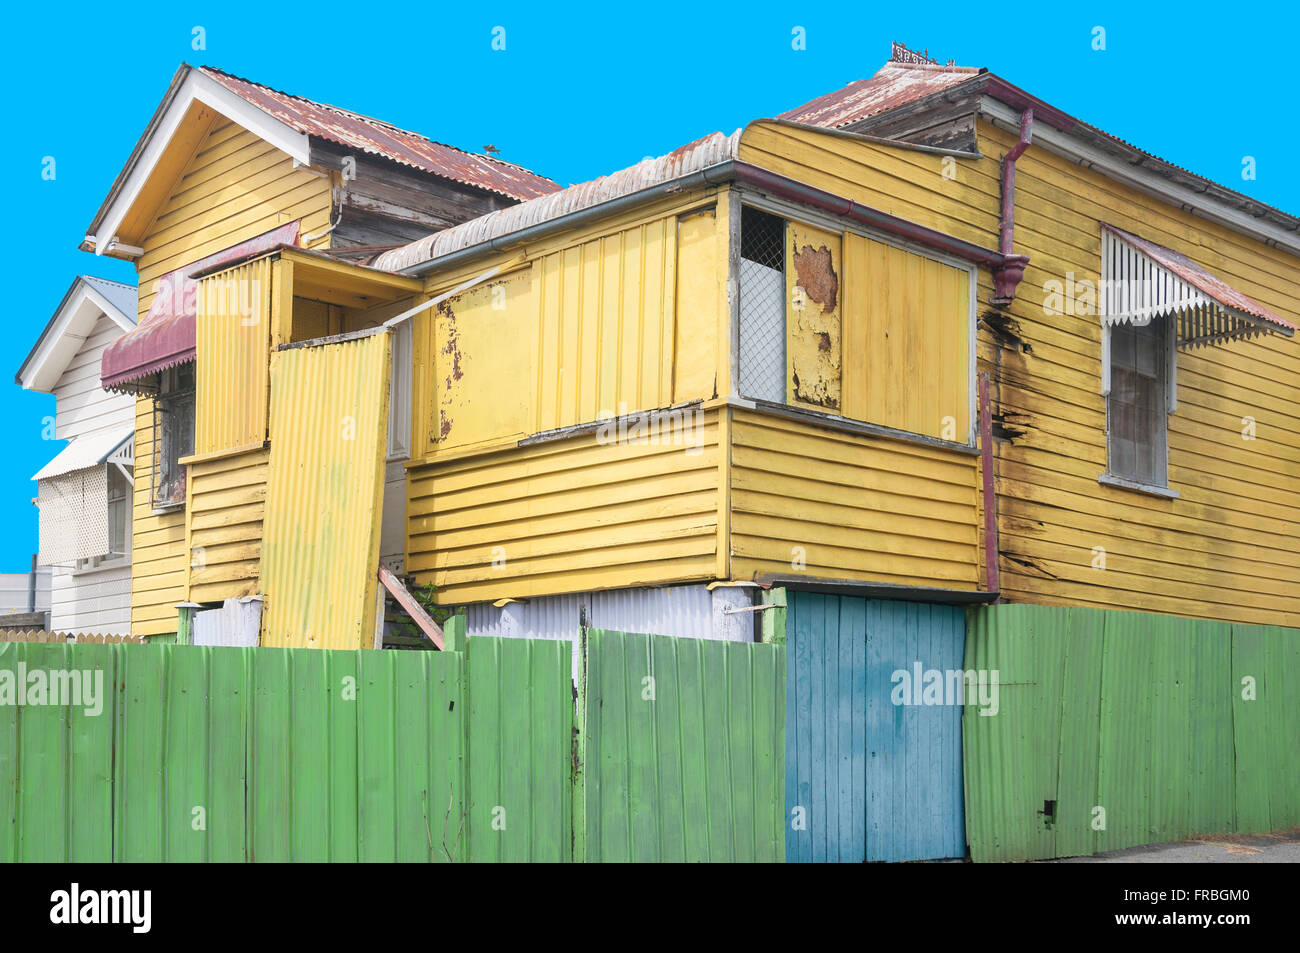 Colourful weatherboard house, Caxton Street, Paddington, Brisbane, Queensland, Australia - Stock Image